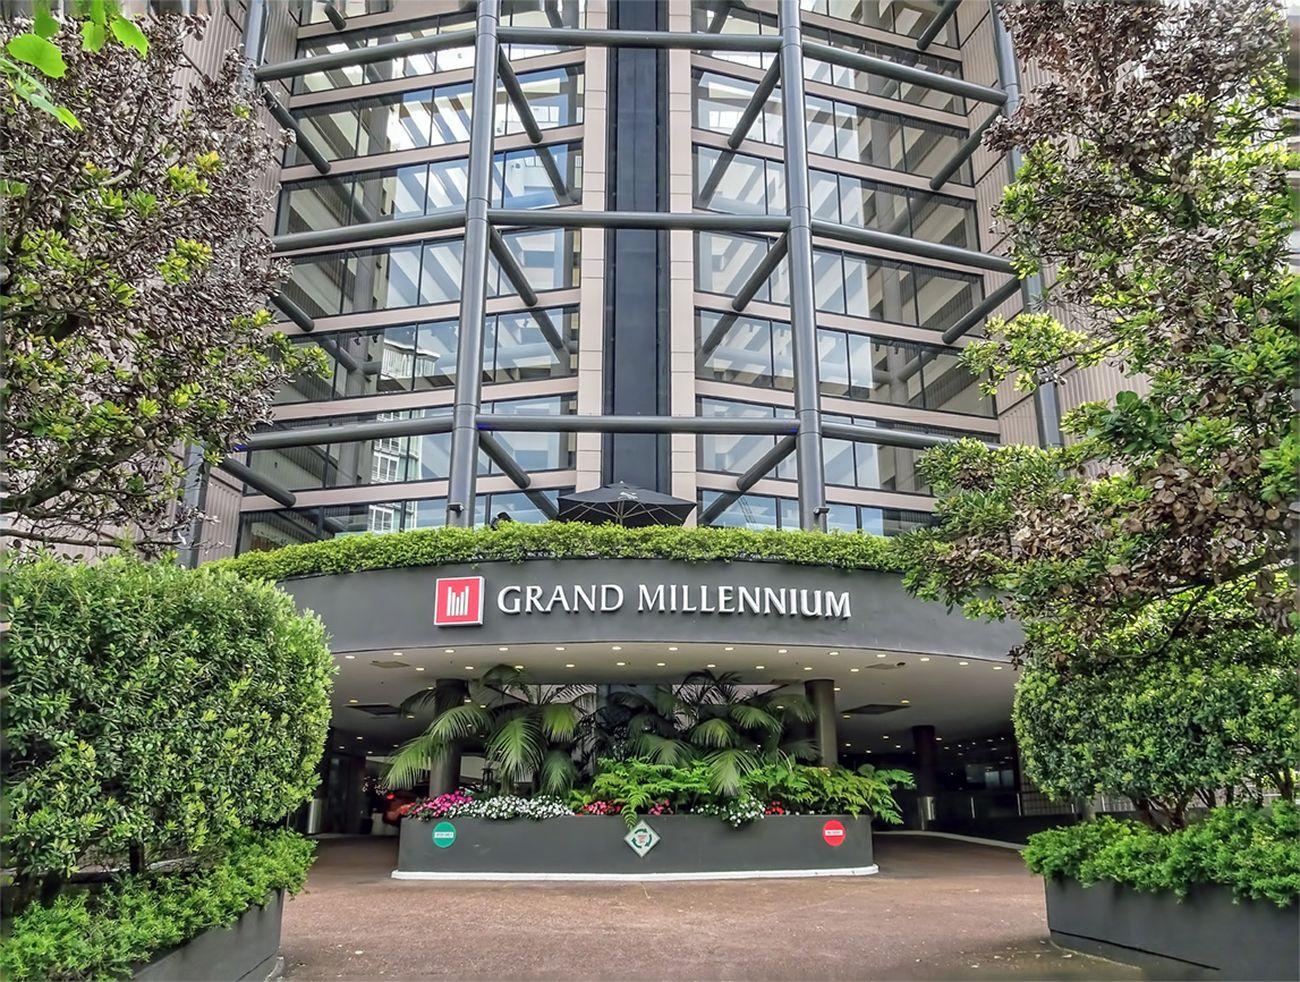 Grand Millenium Hotel (1) - Auckland, New Zealand